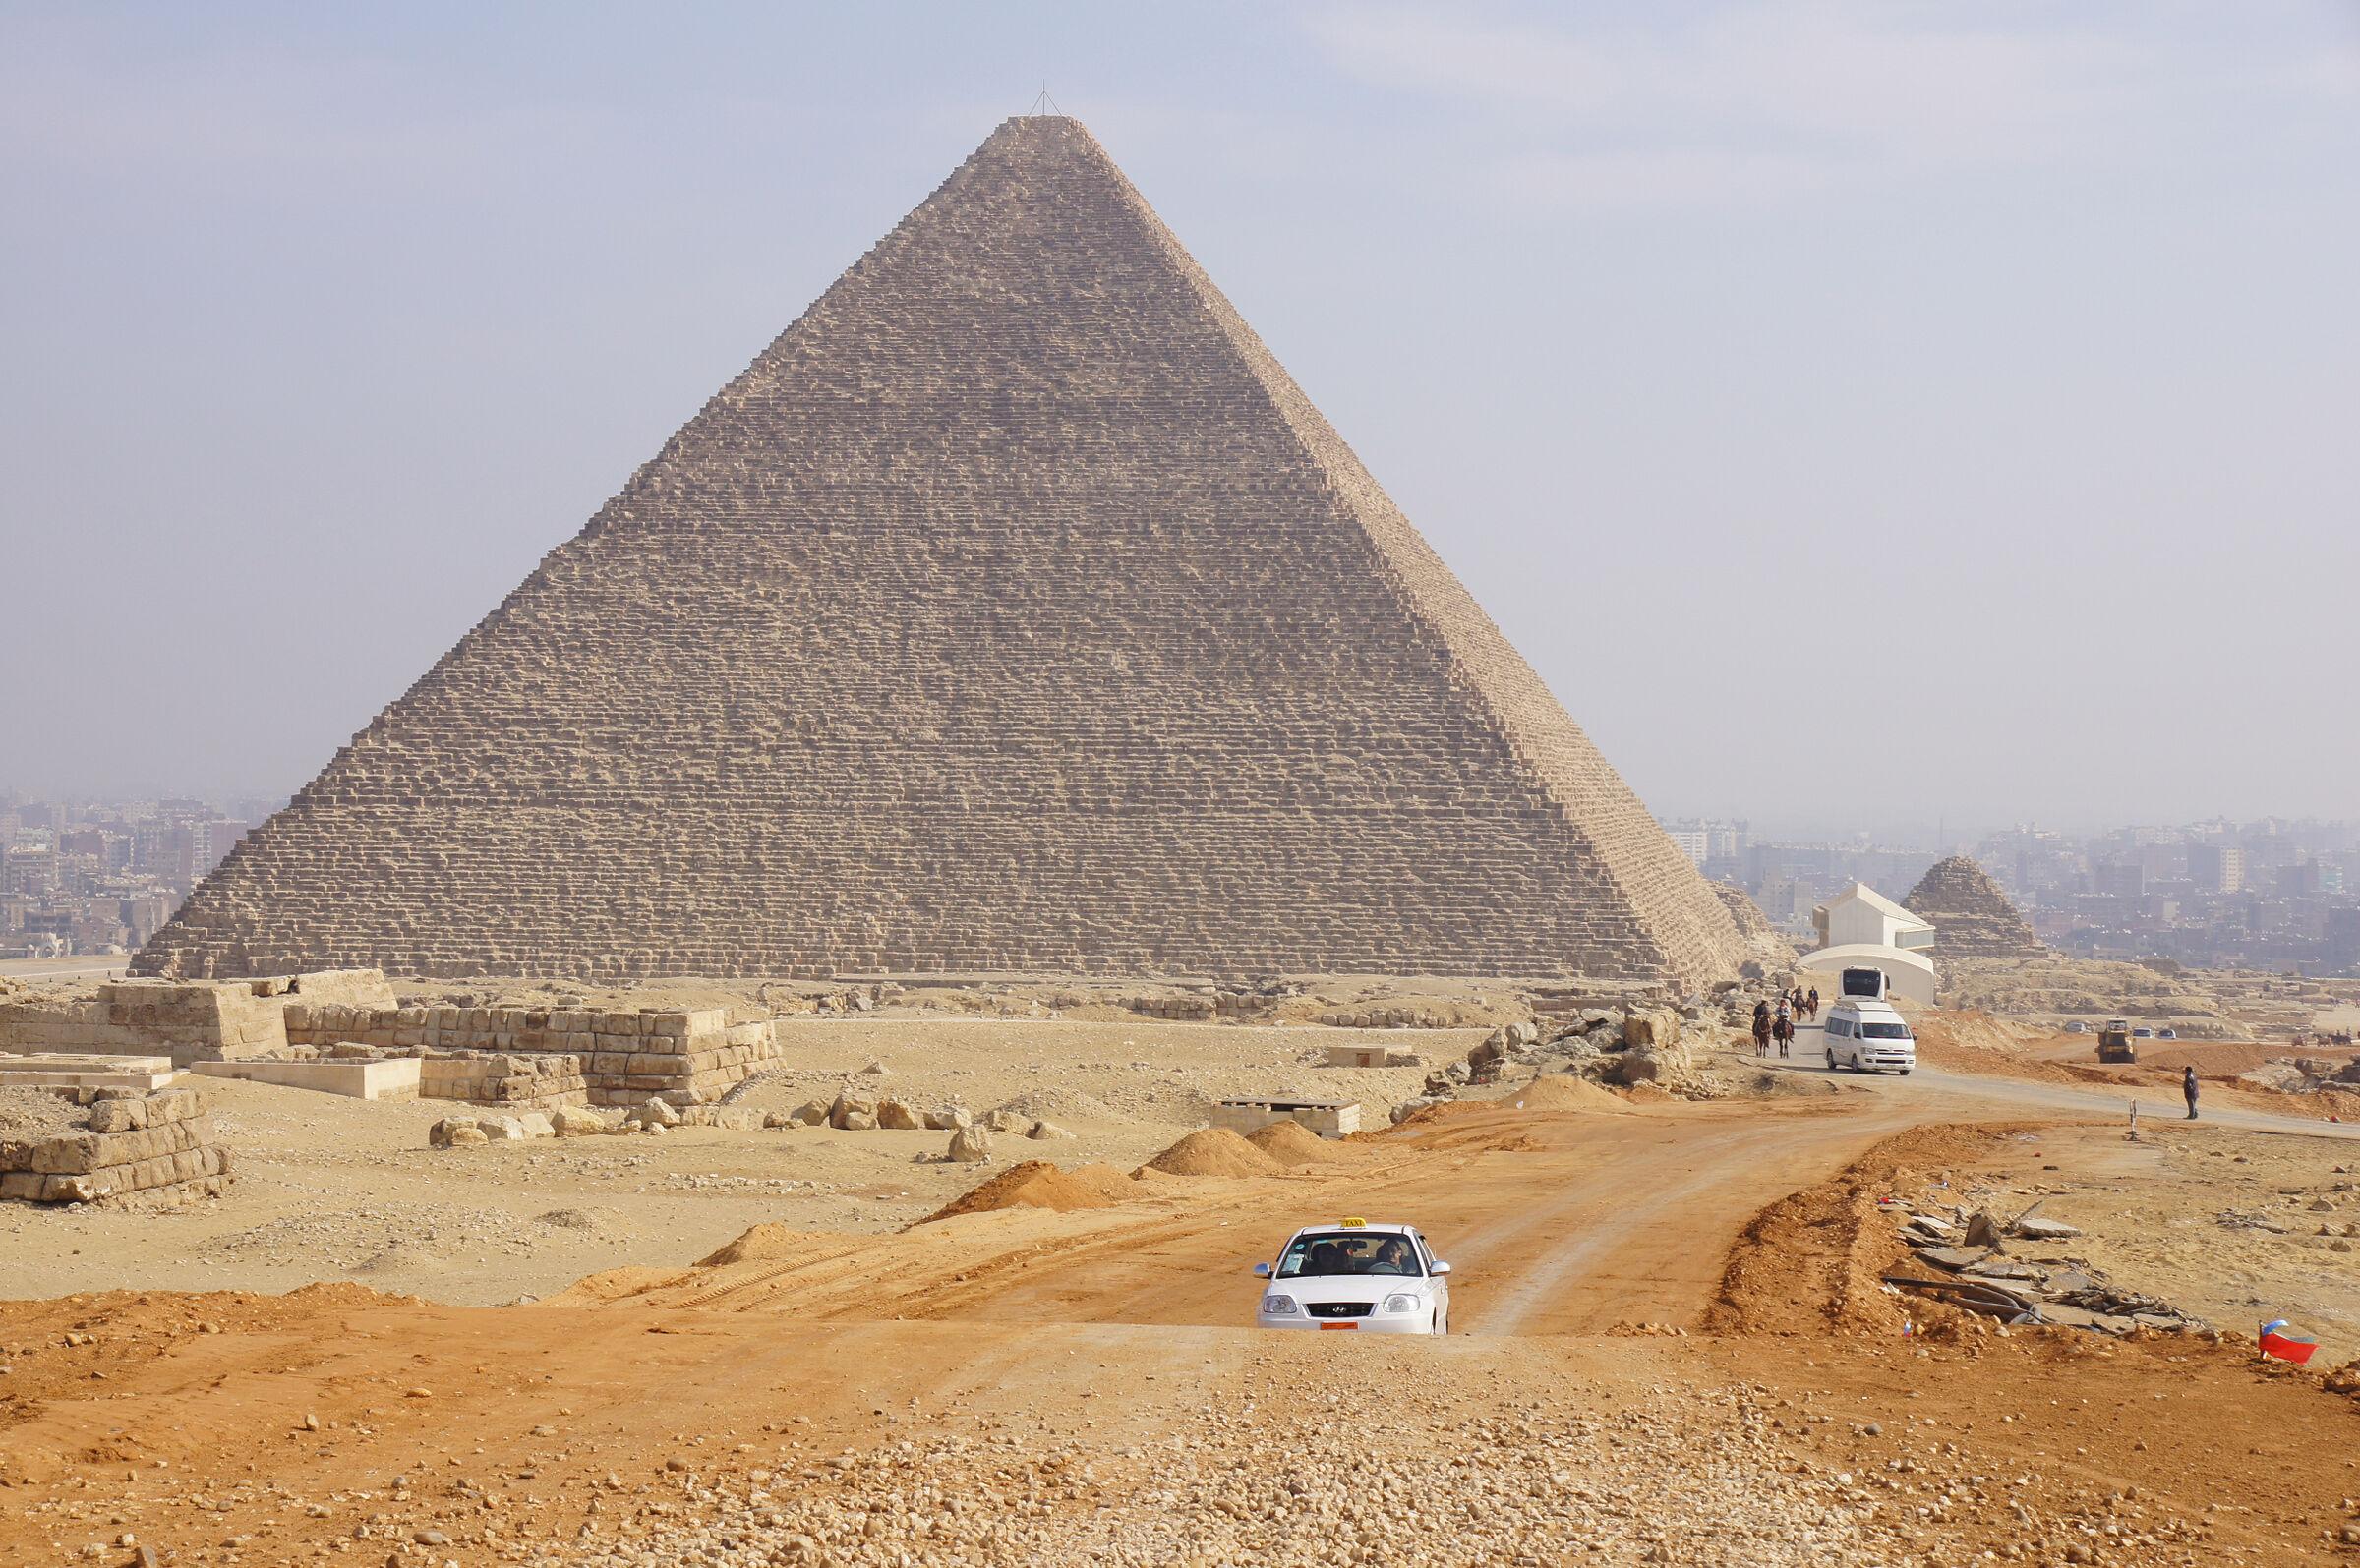 General view: Site: Giza; View: Khufu Pyramid, G 80, G 6027, G 6028, G 6050, G 6020, G 6010, Khufu Boat Museum, G I-South Cemetery, G I-c